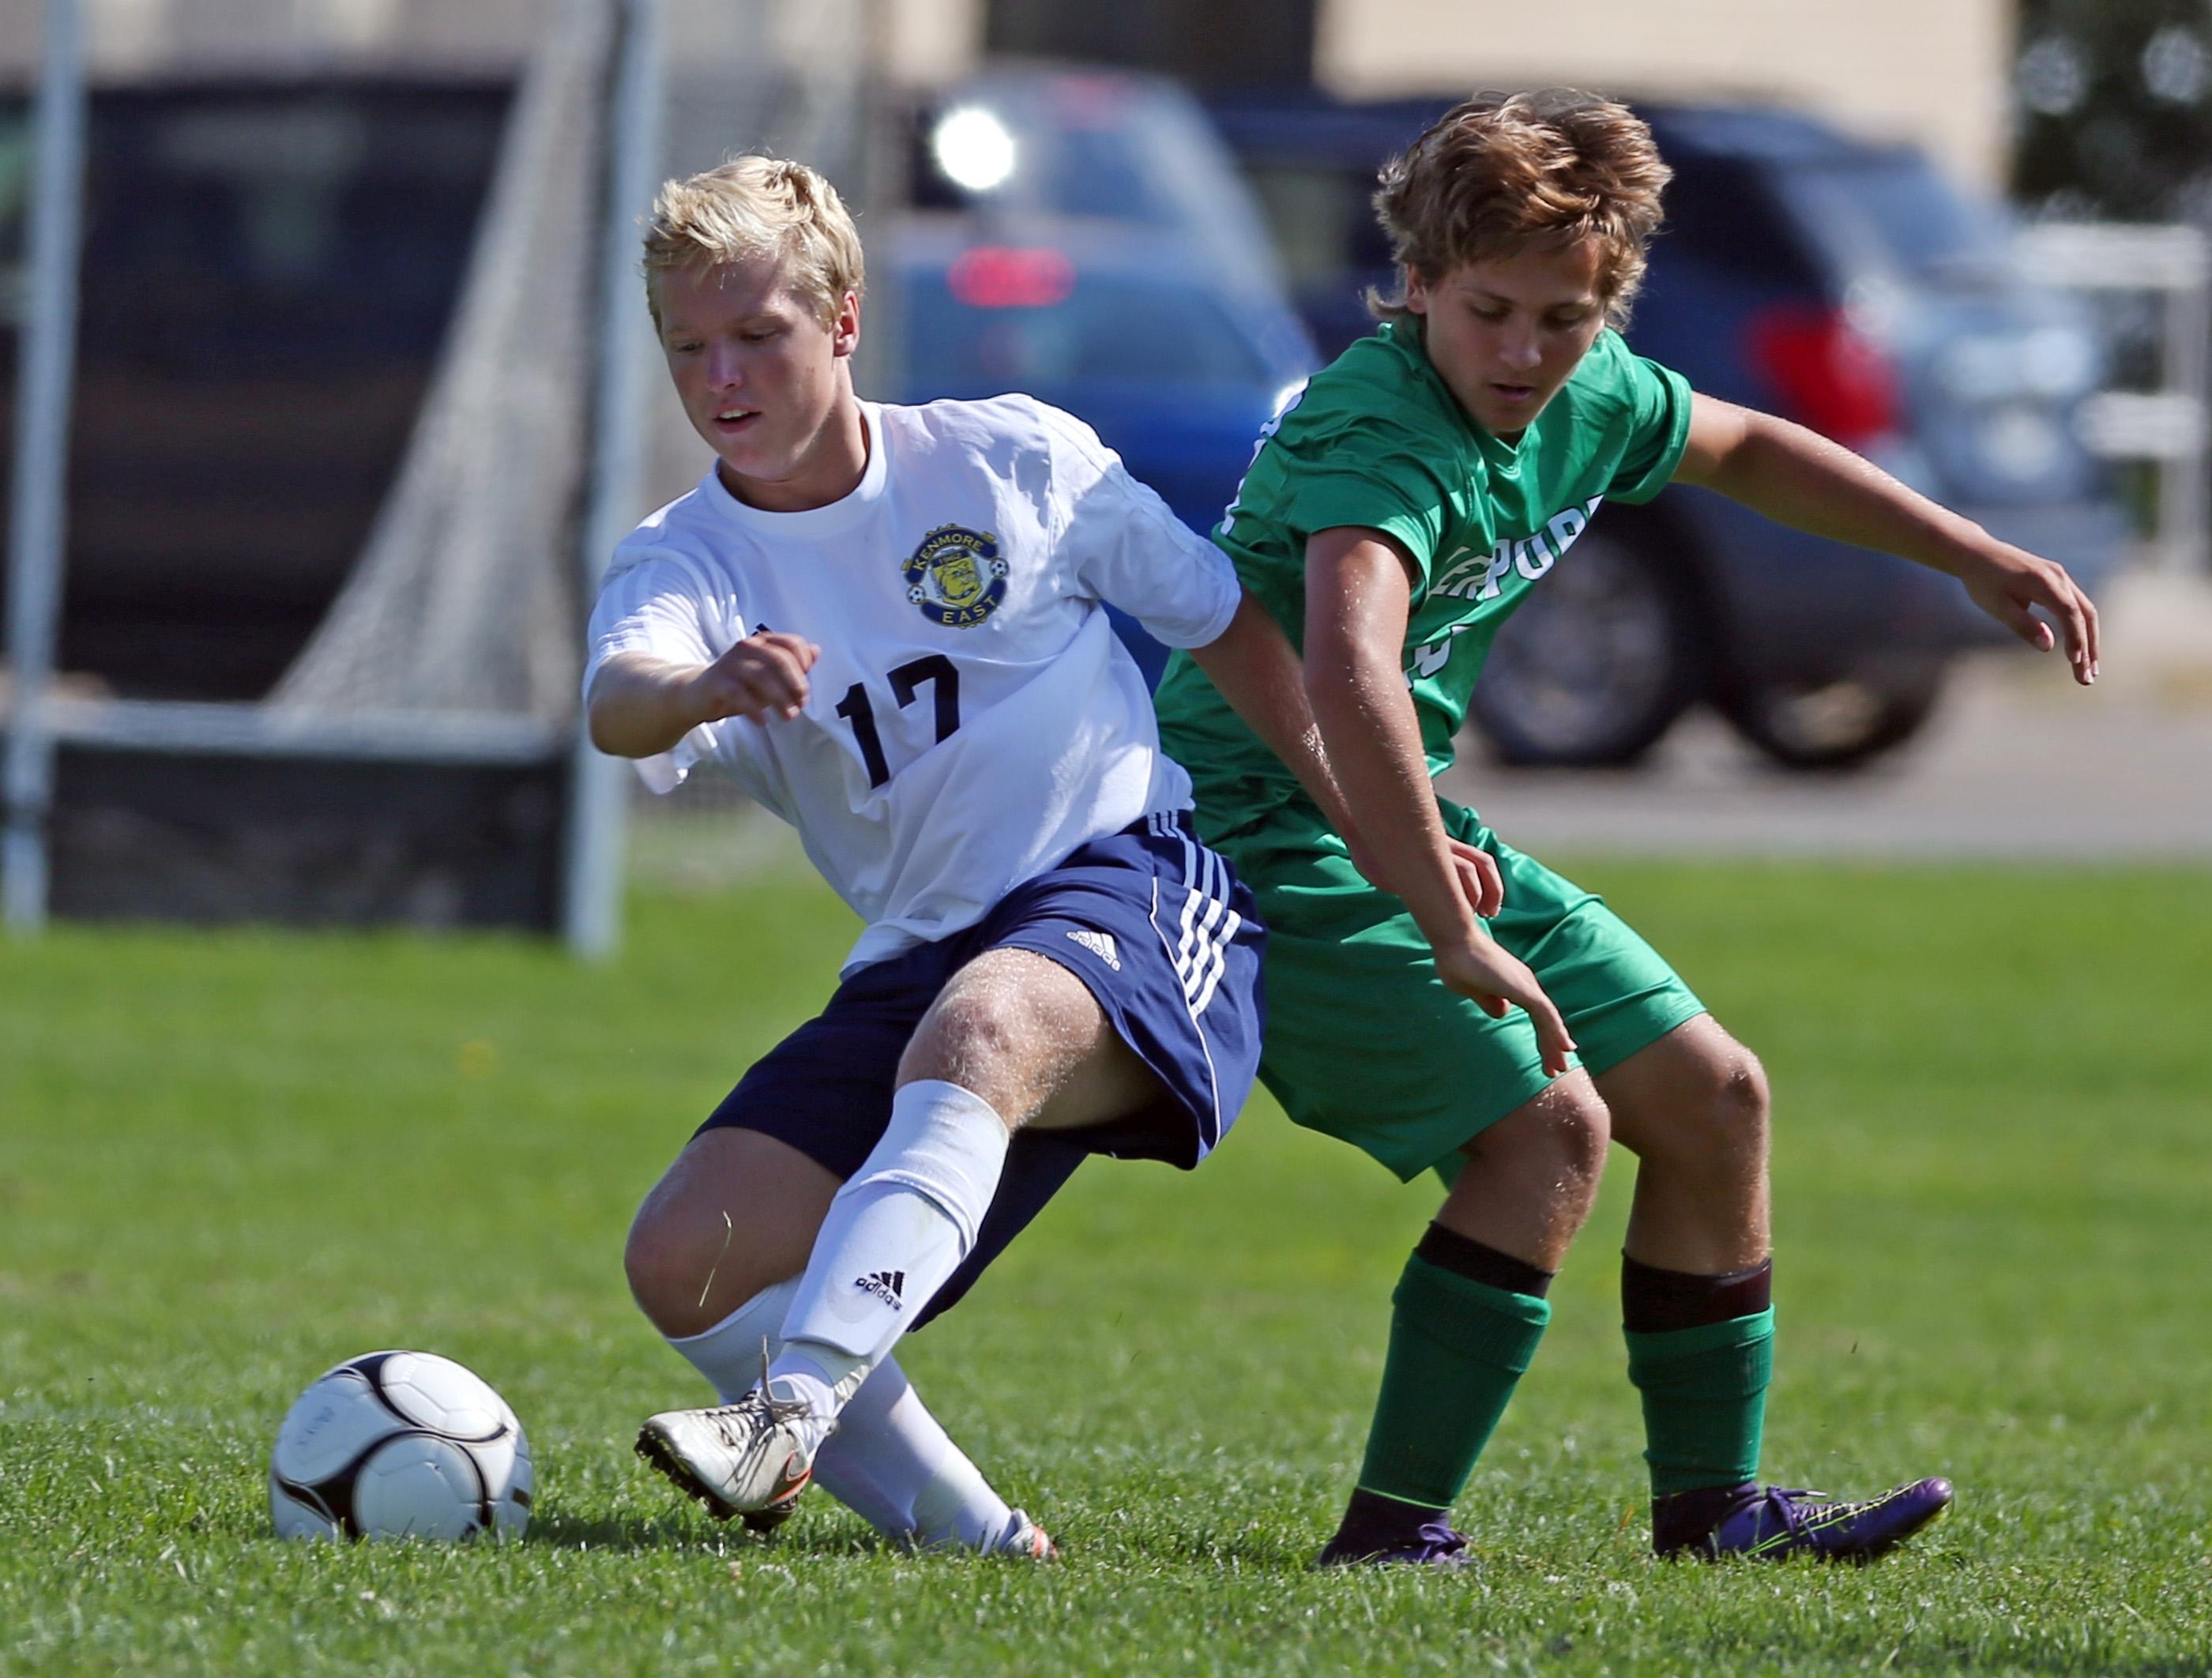 Kenmore East's Brett Wilkinson, left, battles Lewiston-Porter's Joey Zachary in their Niagara Frontier League soccer game Saturday. (James P. McCoy/Buffalo News)